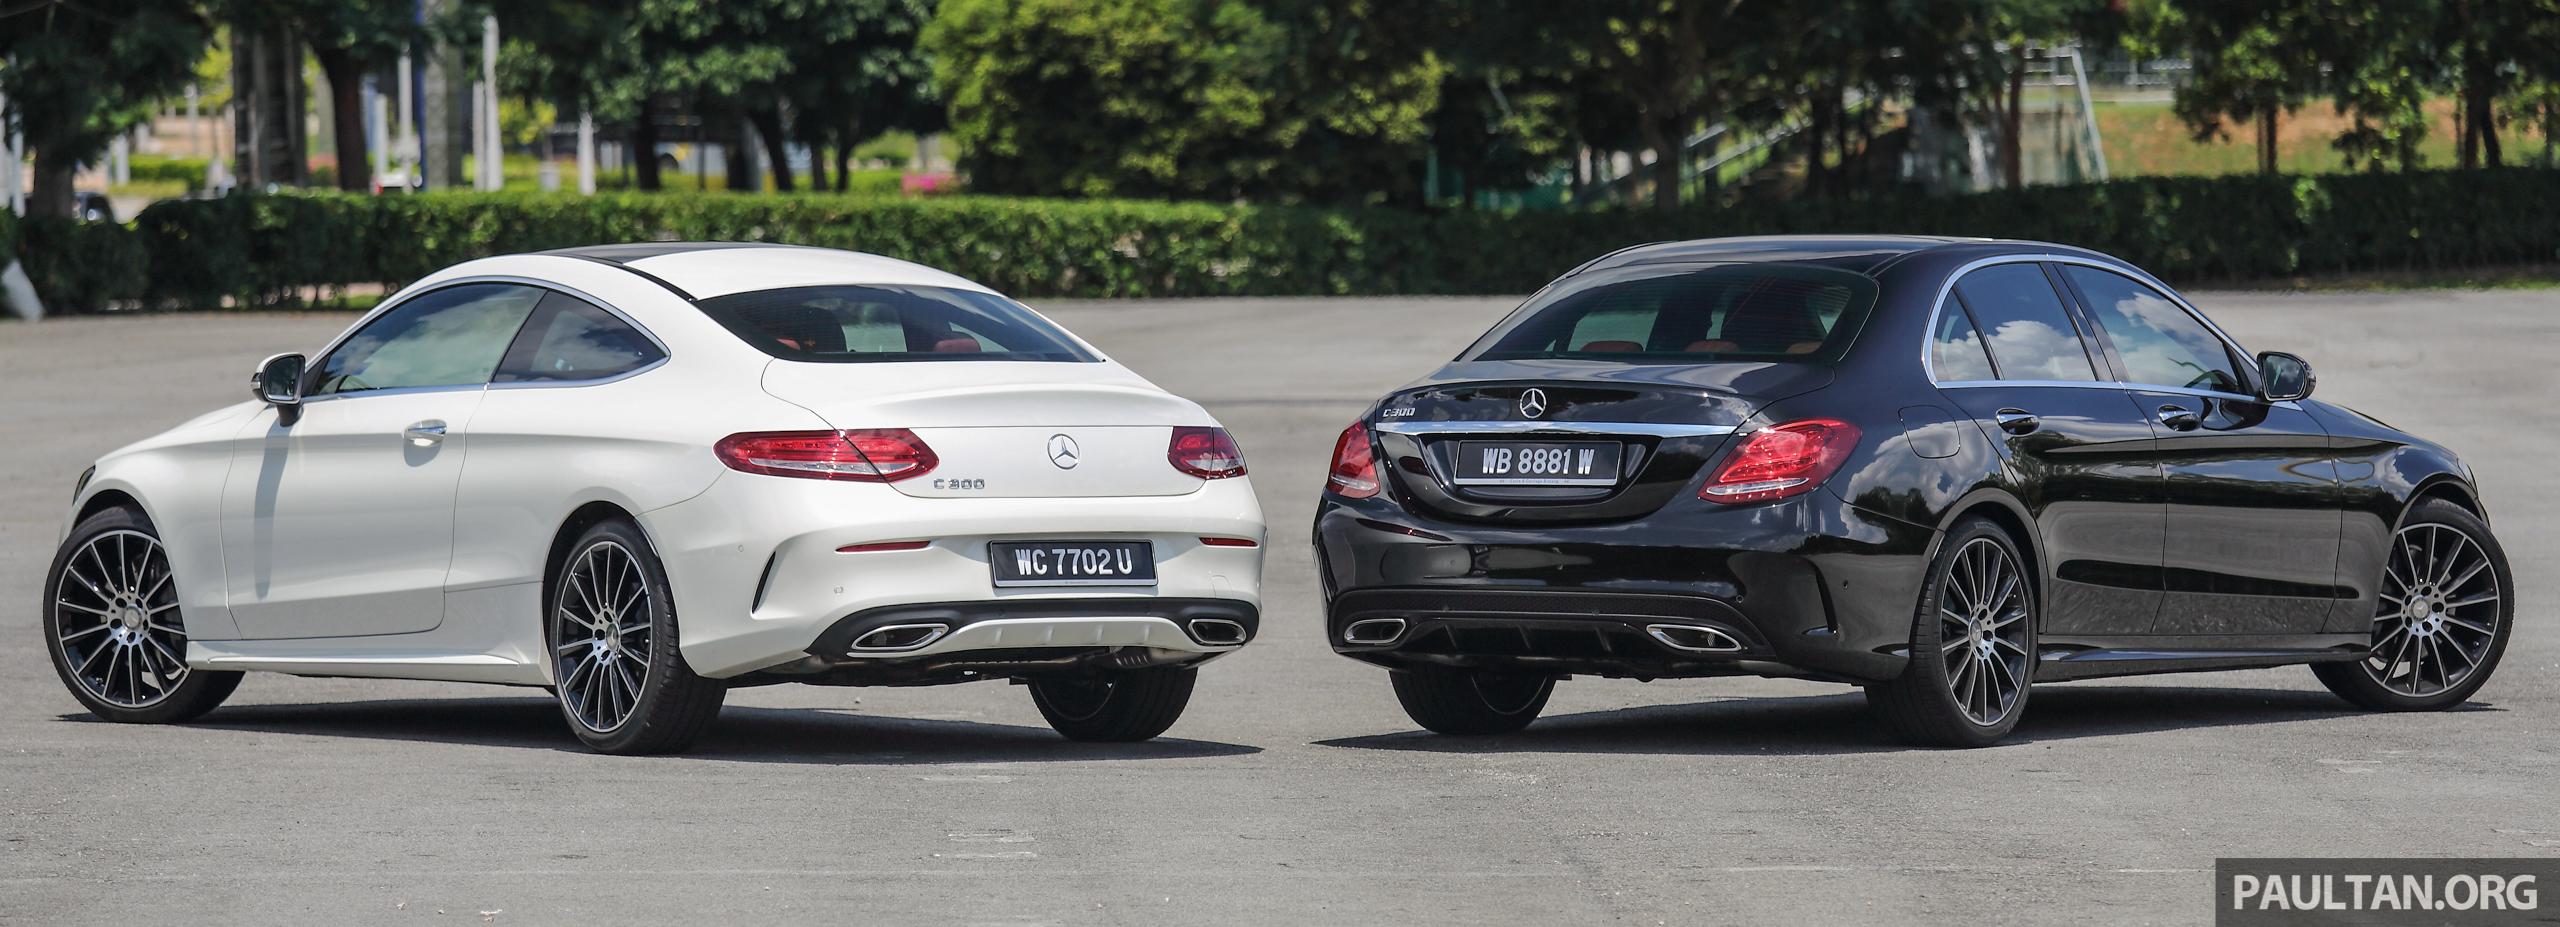 Coupe Vs Sedan >> GALLERY: Mercedes-Benz C300 Coupe vs sedan Image 495917